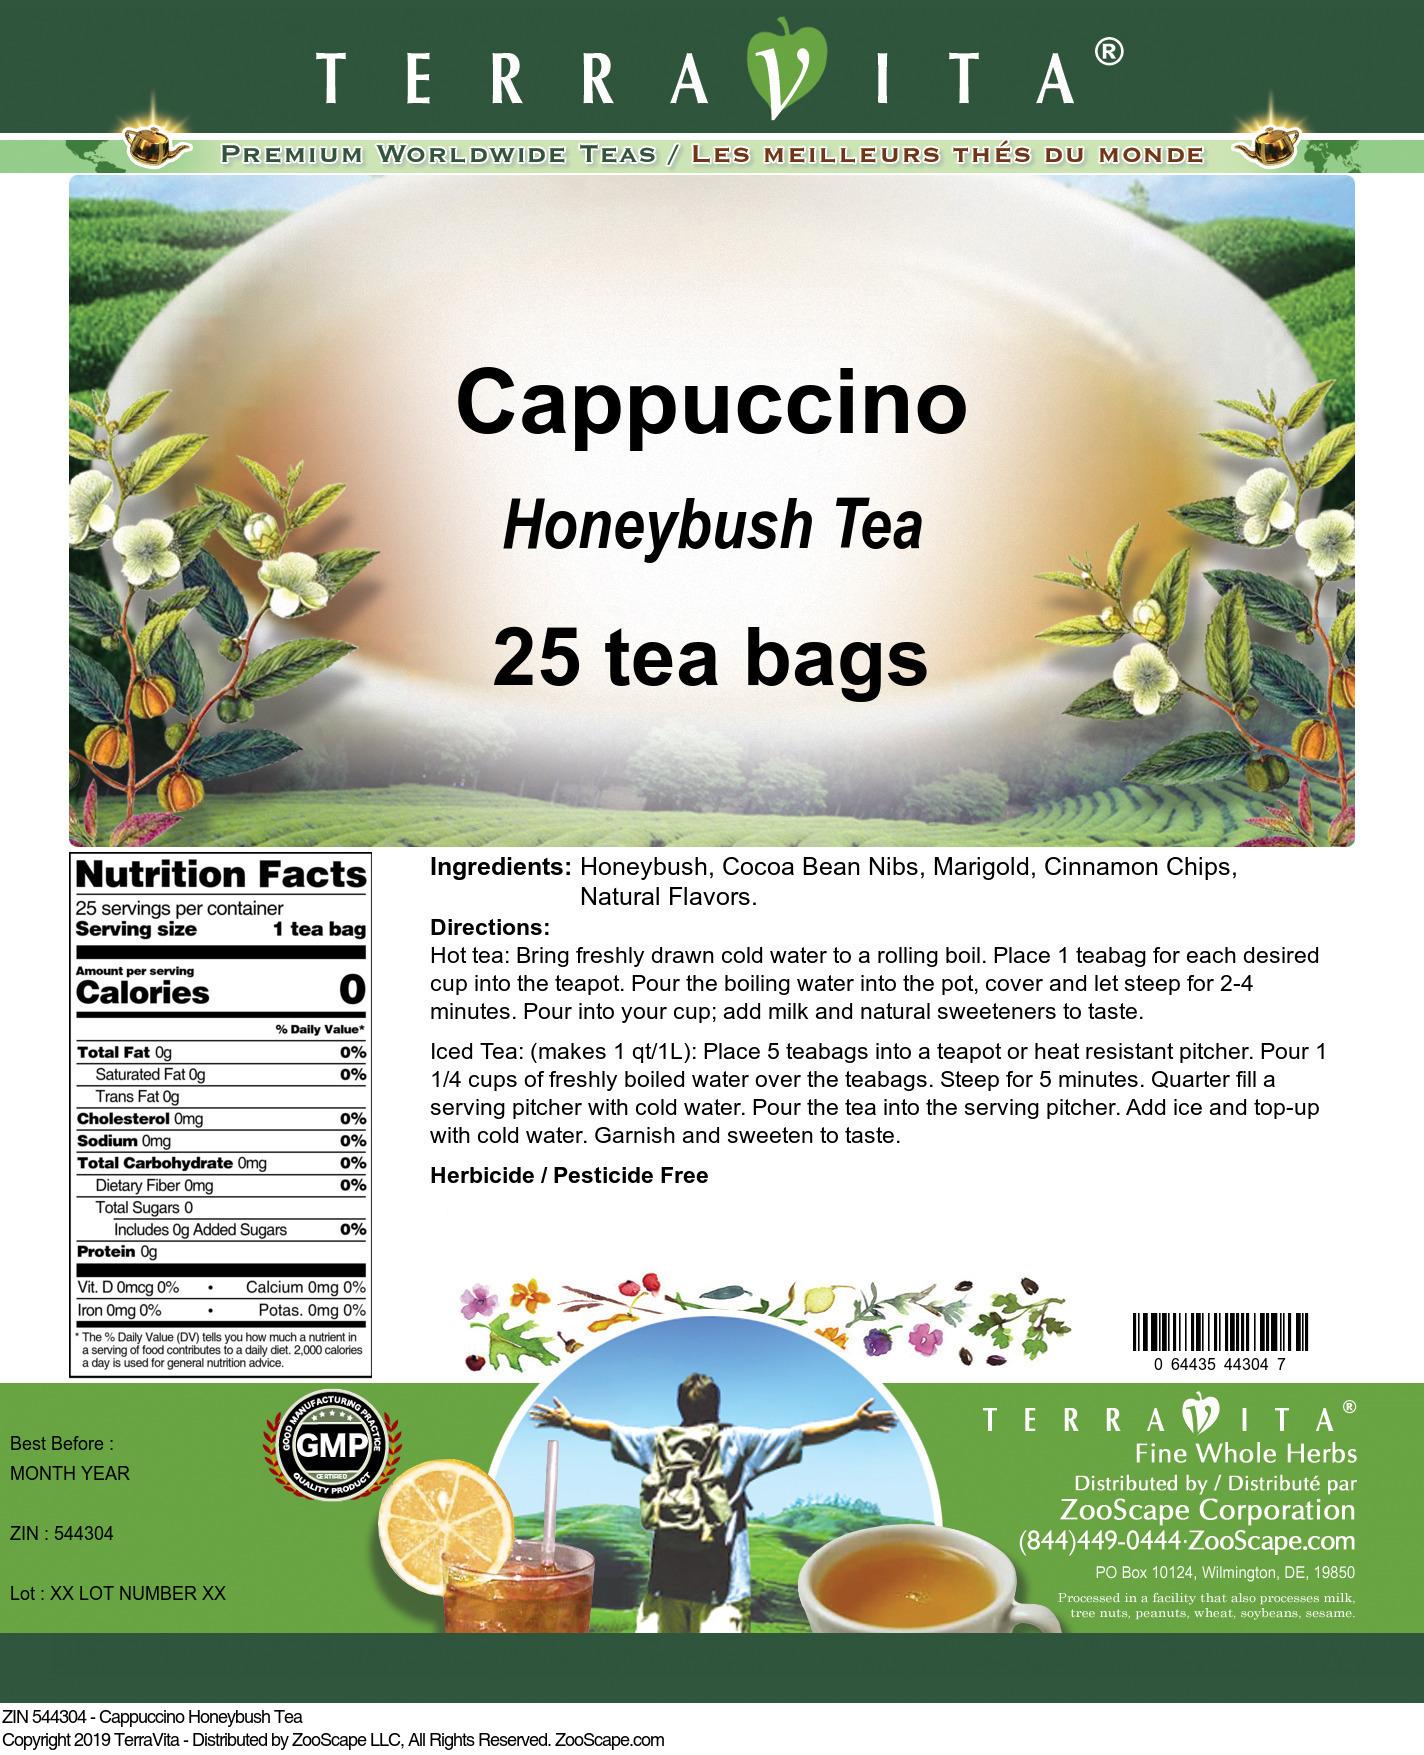 Cappuccino Honeybush Tea